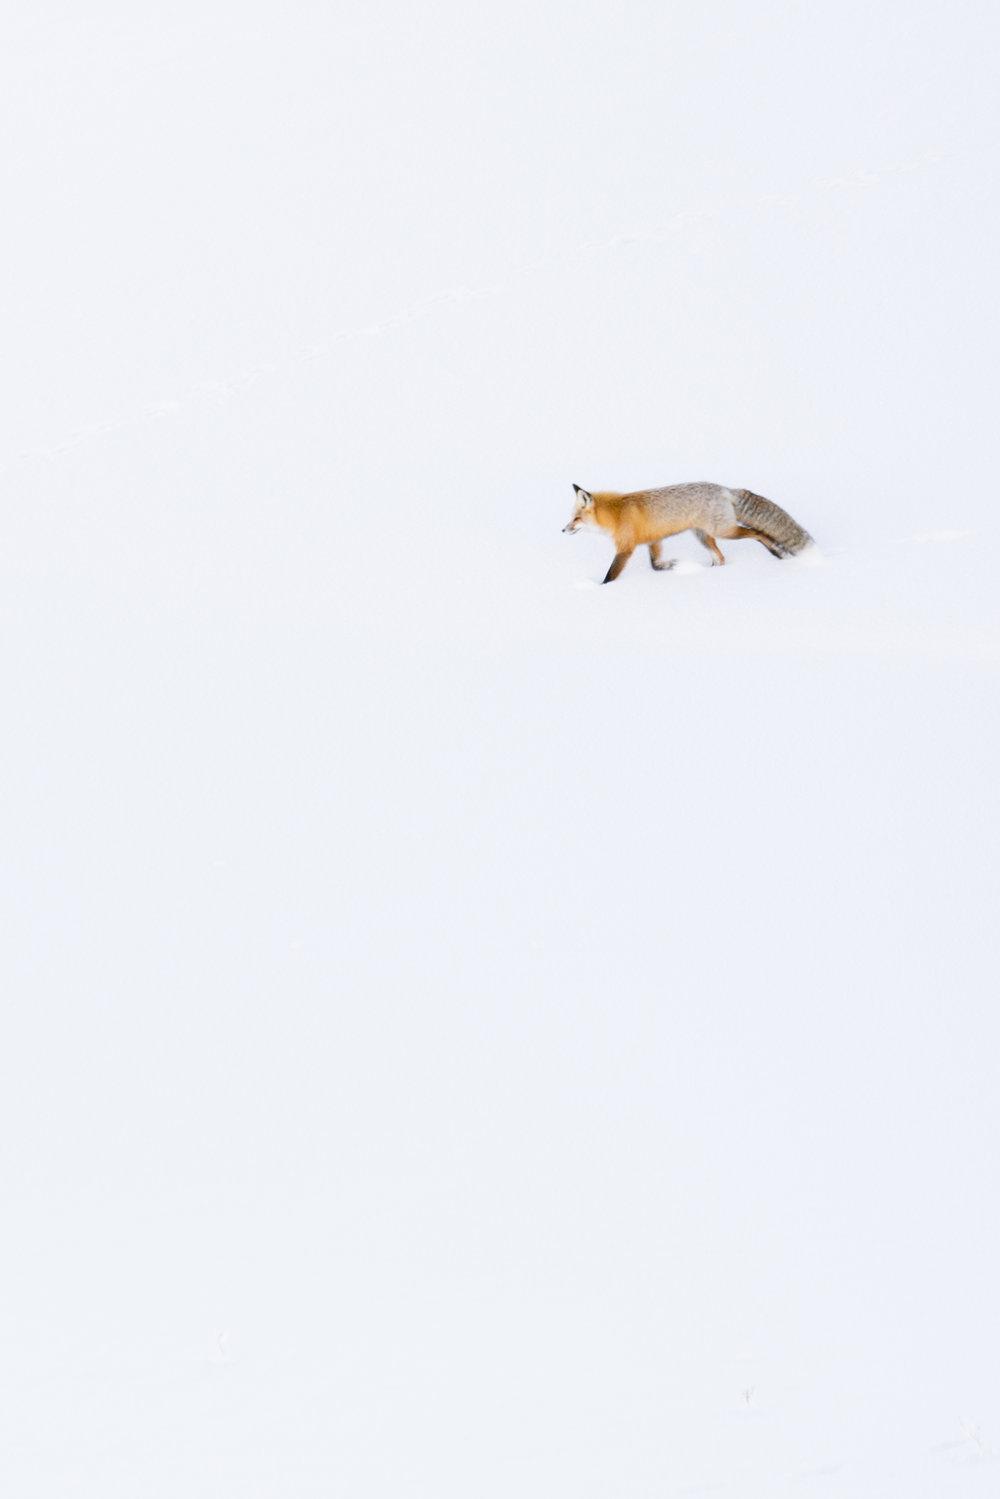 A fox in Hayden Valley, Yellowstone National Park